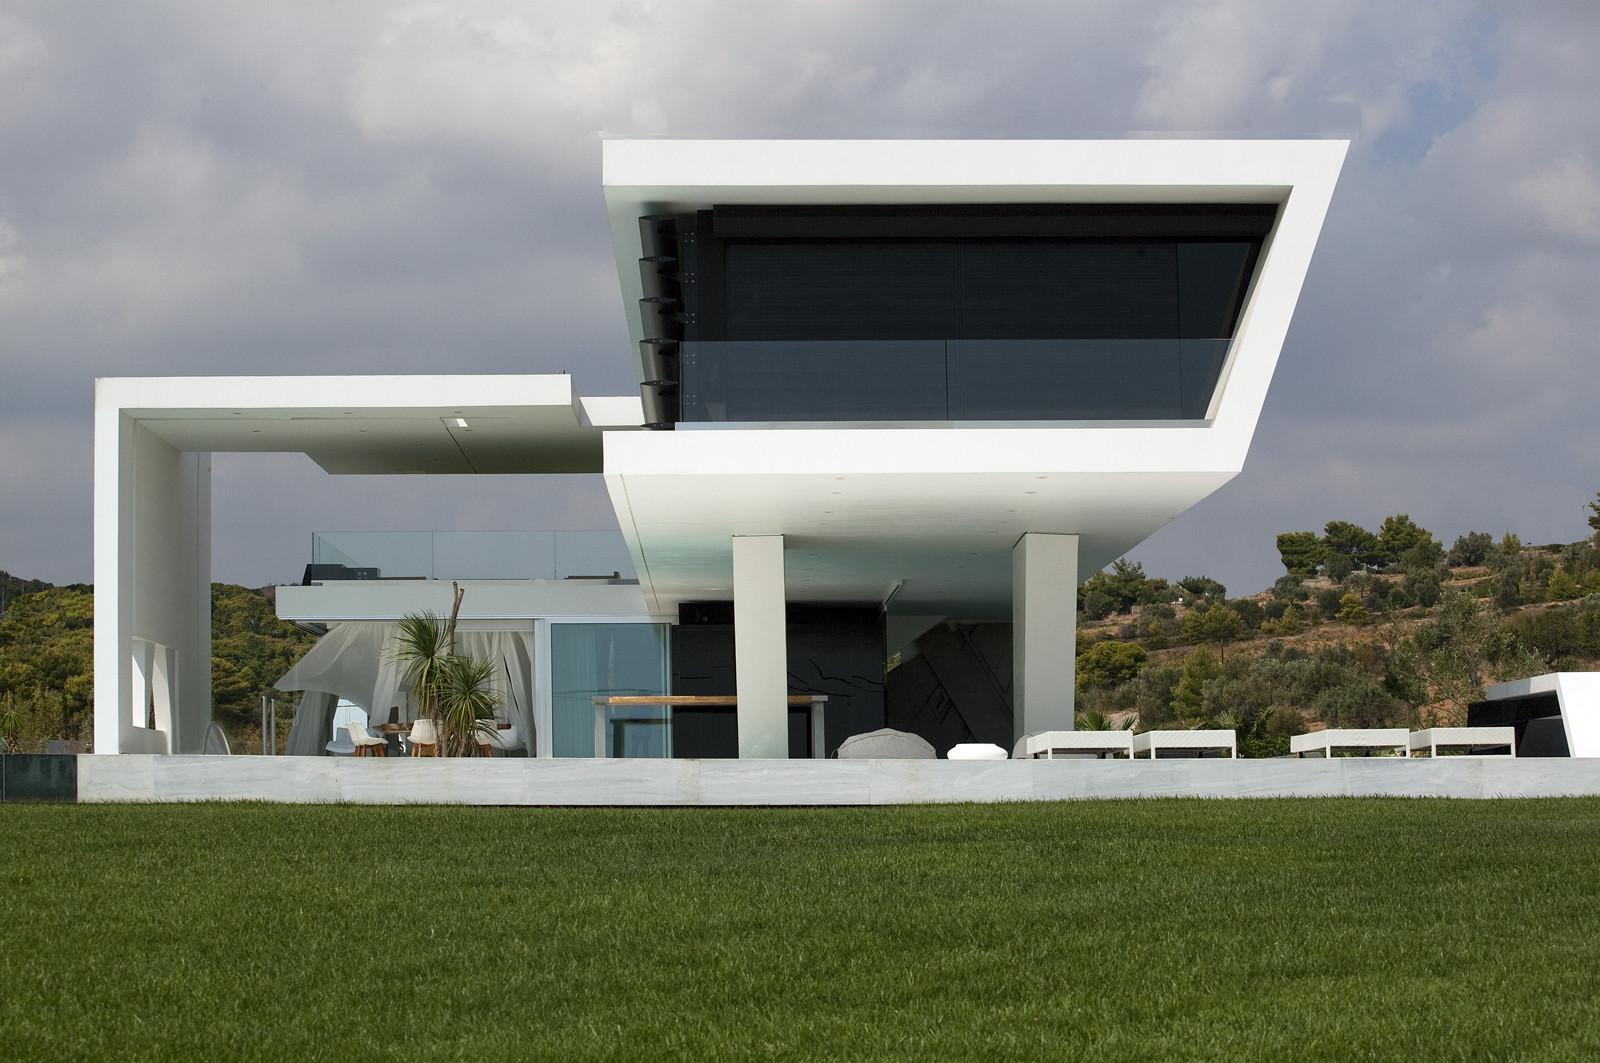 Gallery of H3 / 314 Architecture Studio - 1